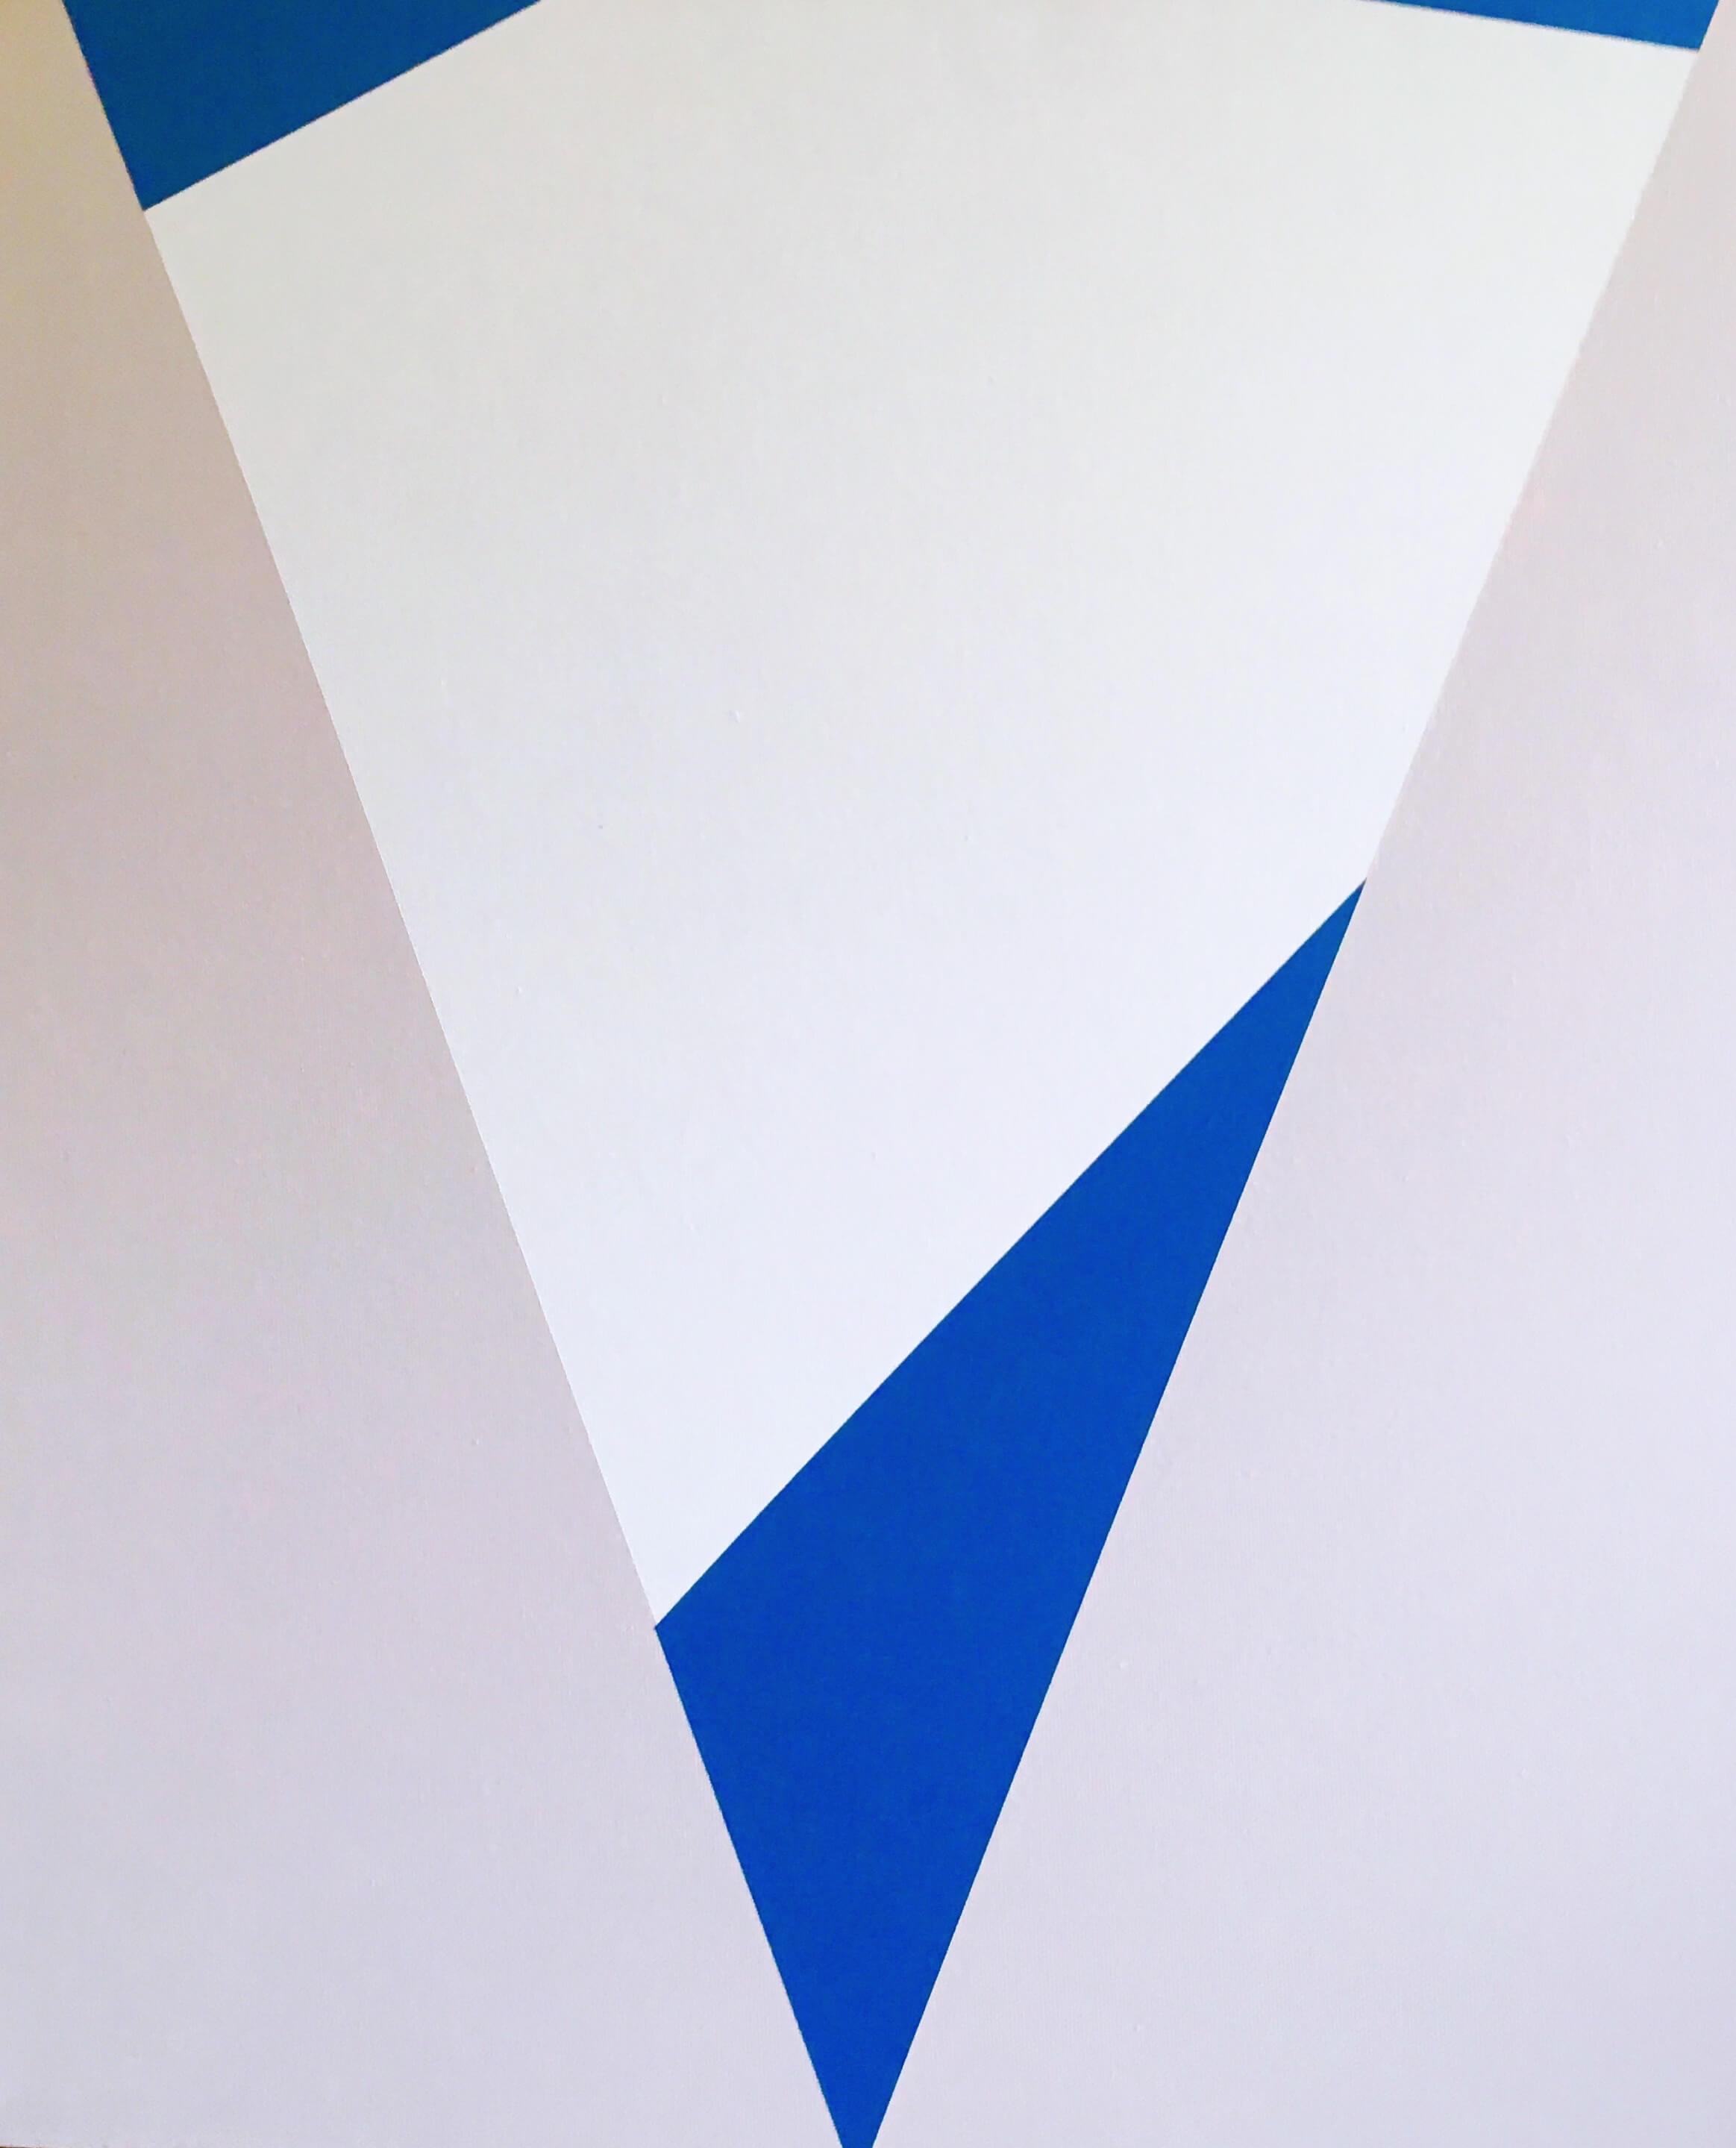 Minimal 18, 60 cm x 50 x 4 cm, Acryl auf Leinwand, © Ute Latzke, 2016, 500,- Euro.